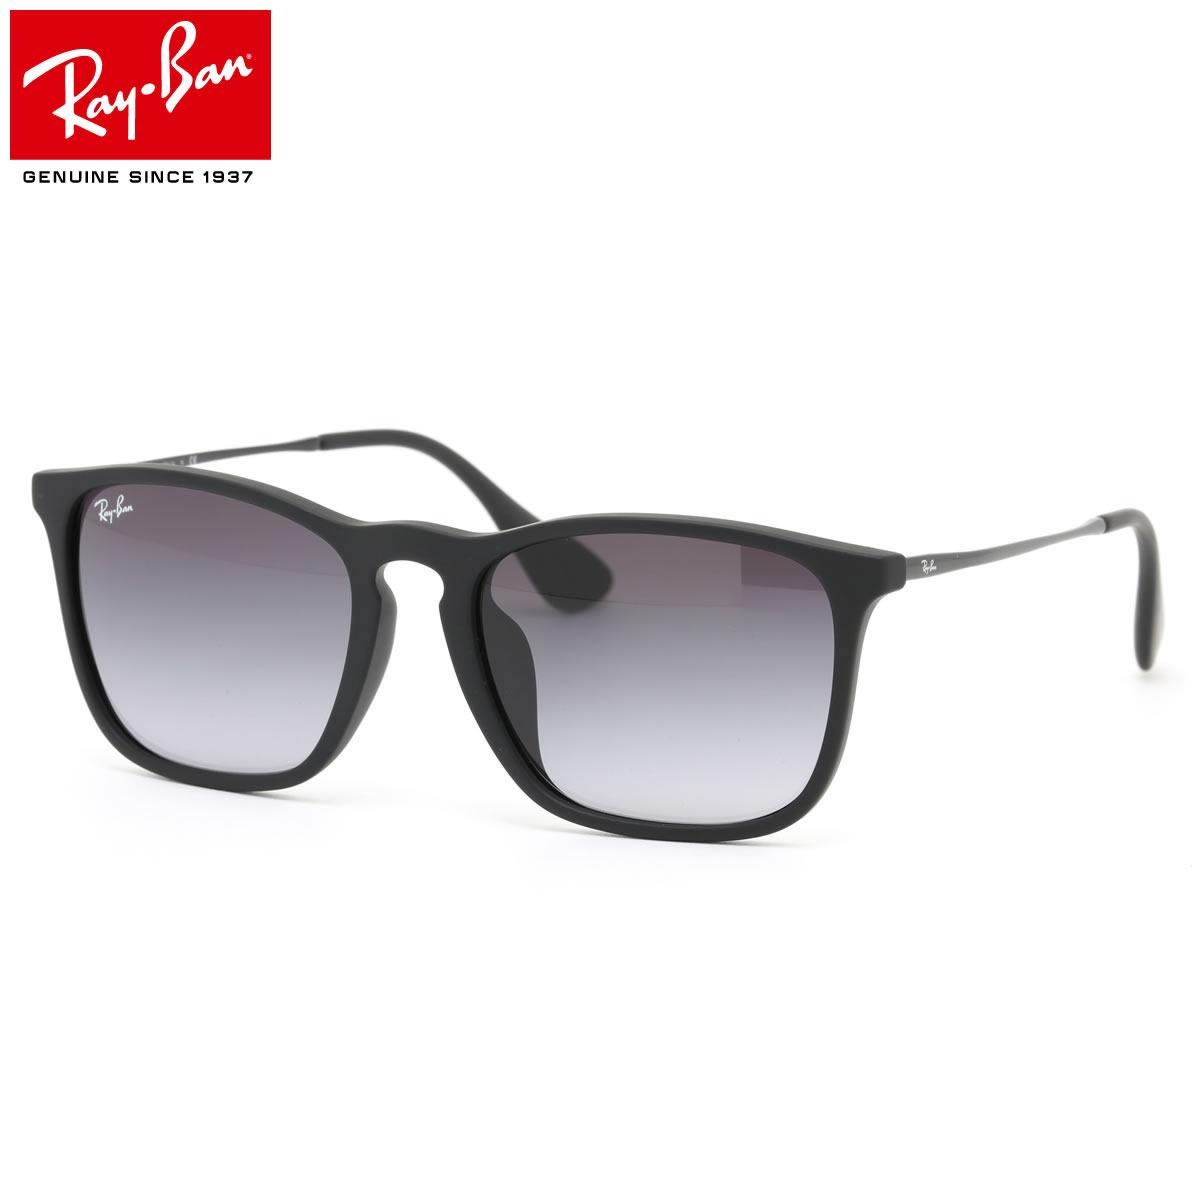 00befcee0e1 Optical Shop Thats  Ray-Ban Sunglasses RB4187F 622 8G 54size CHRIS ...